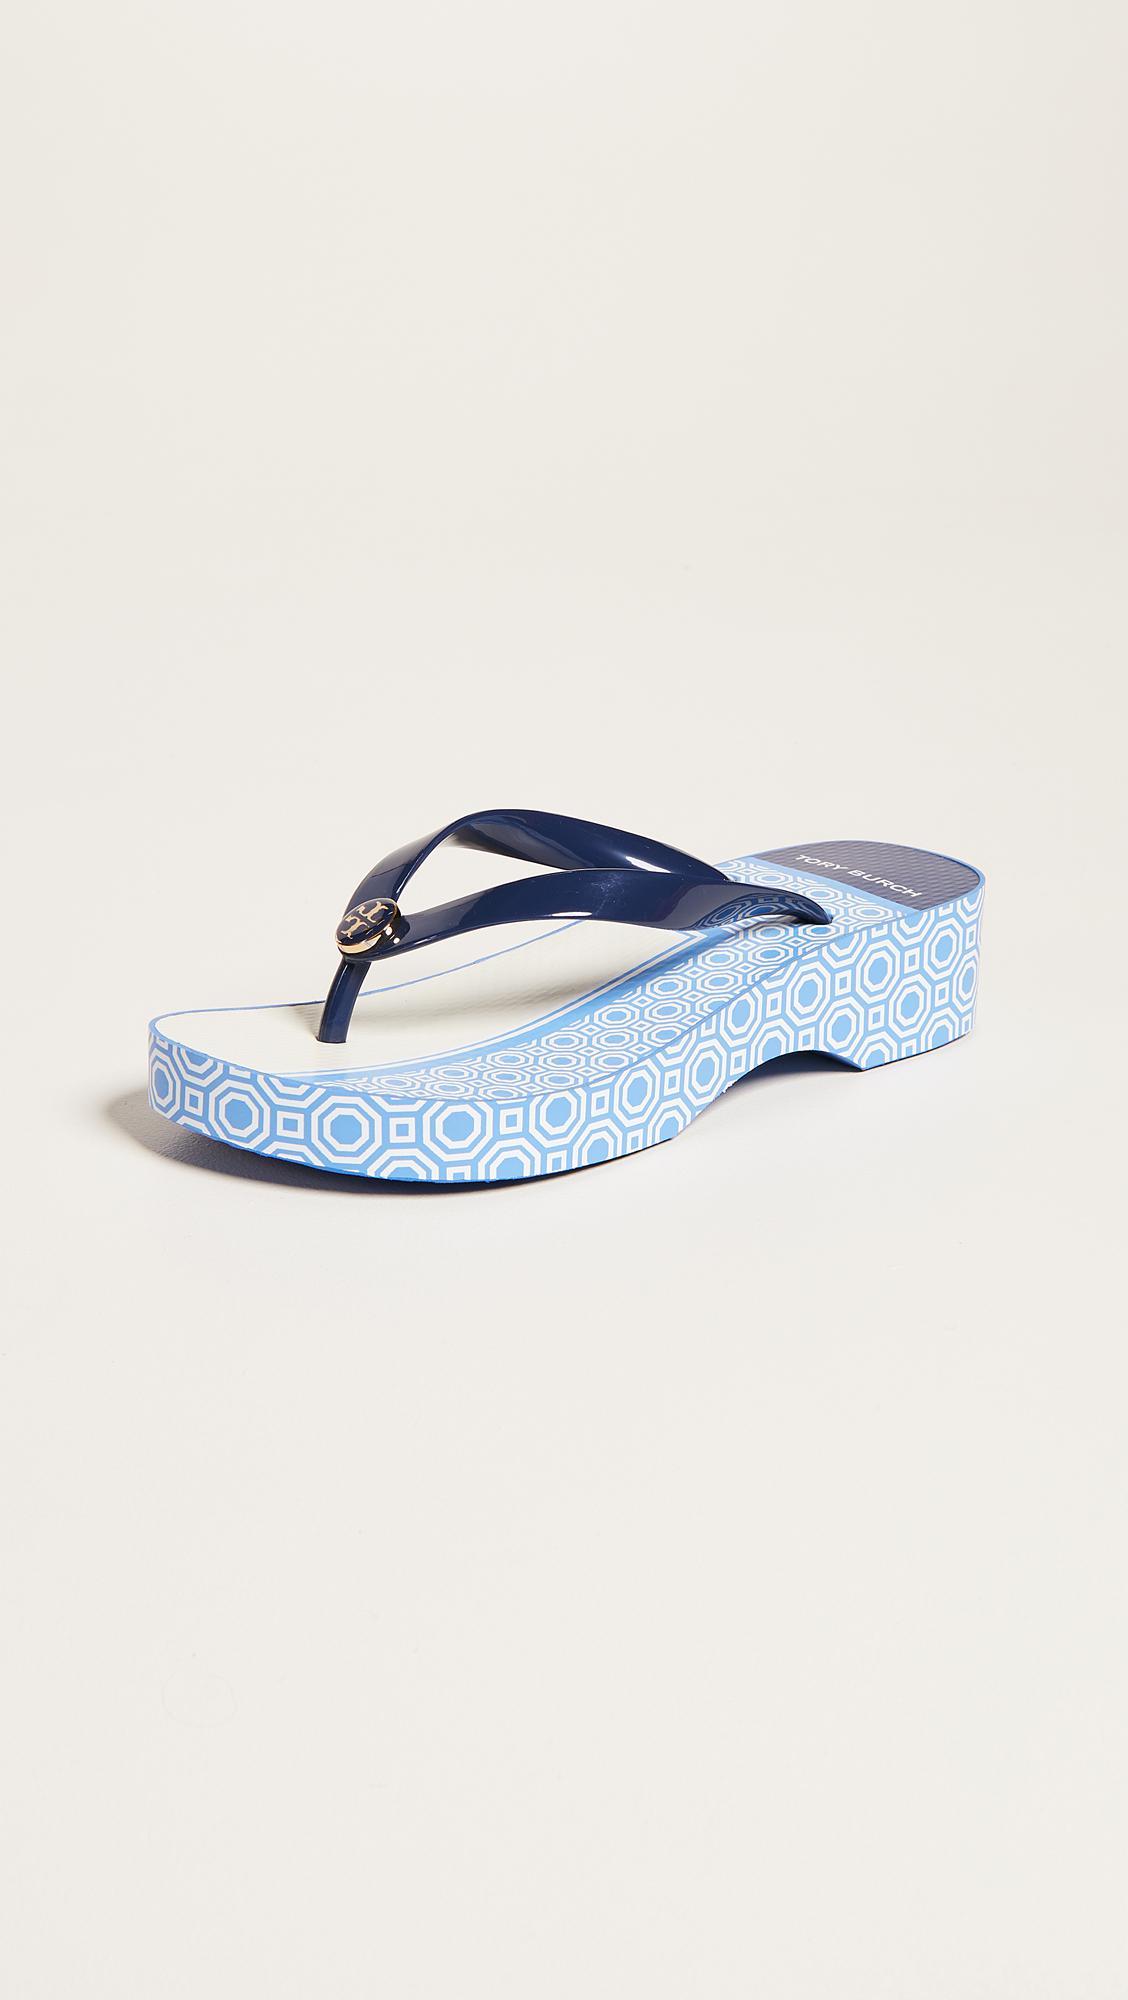 e29a778ff Lyst - Tory Burch Cutout Wedge Flip Flops in Blue